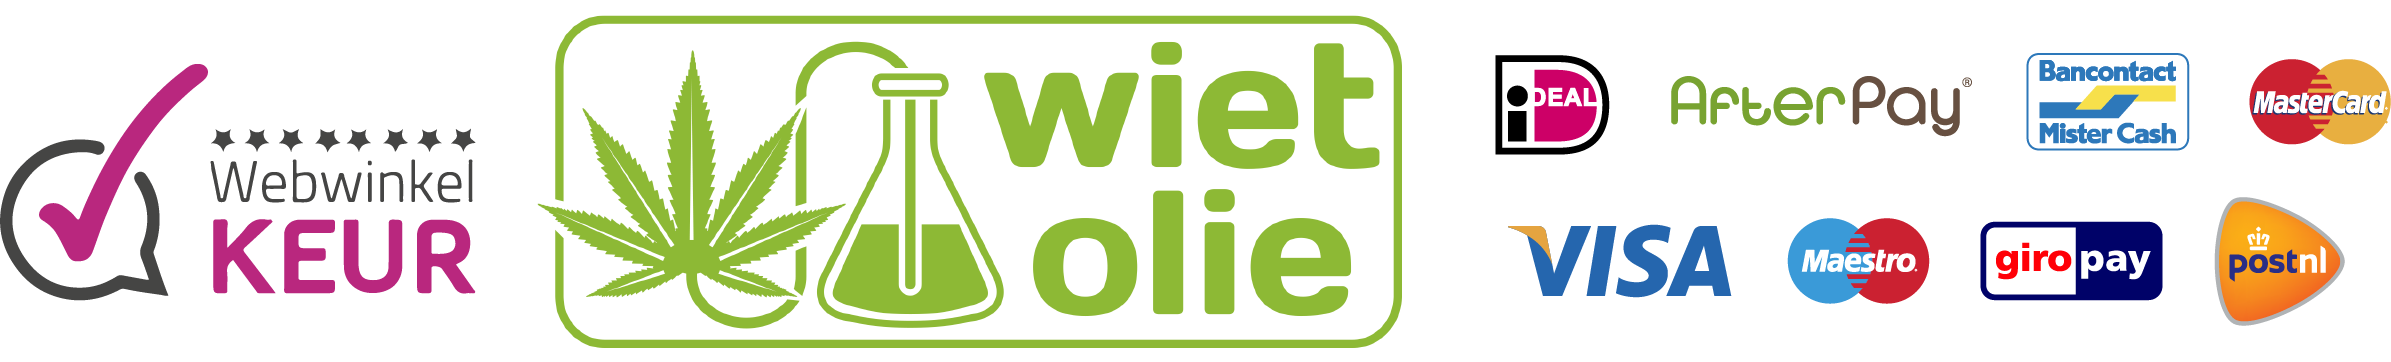 Wietolie.nl I De ruimste keus in CBD-wietolie!